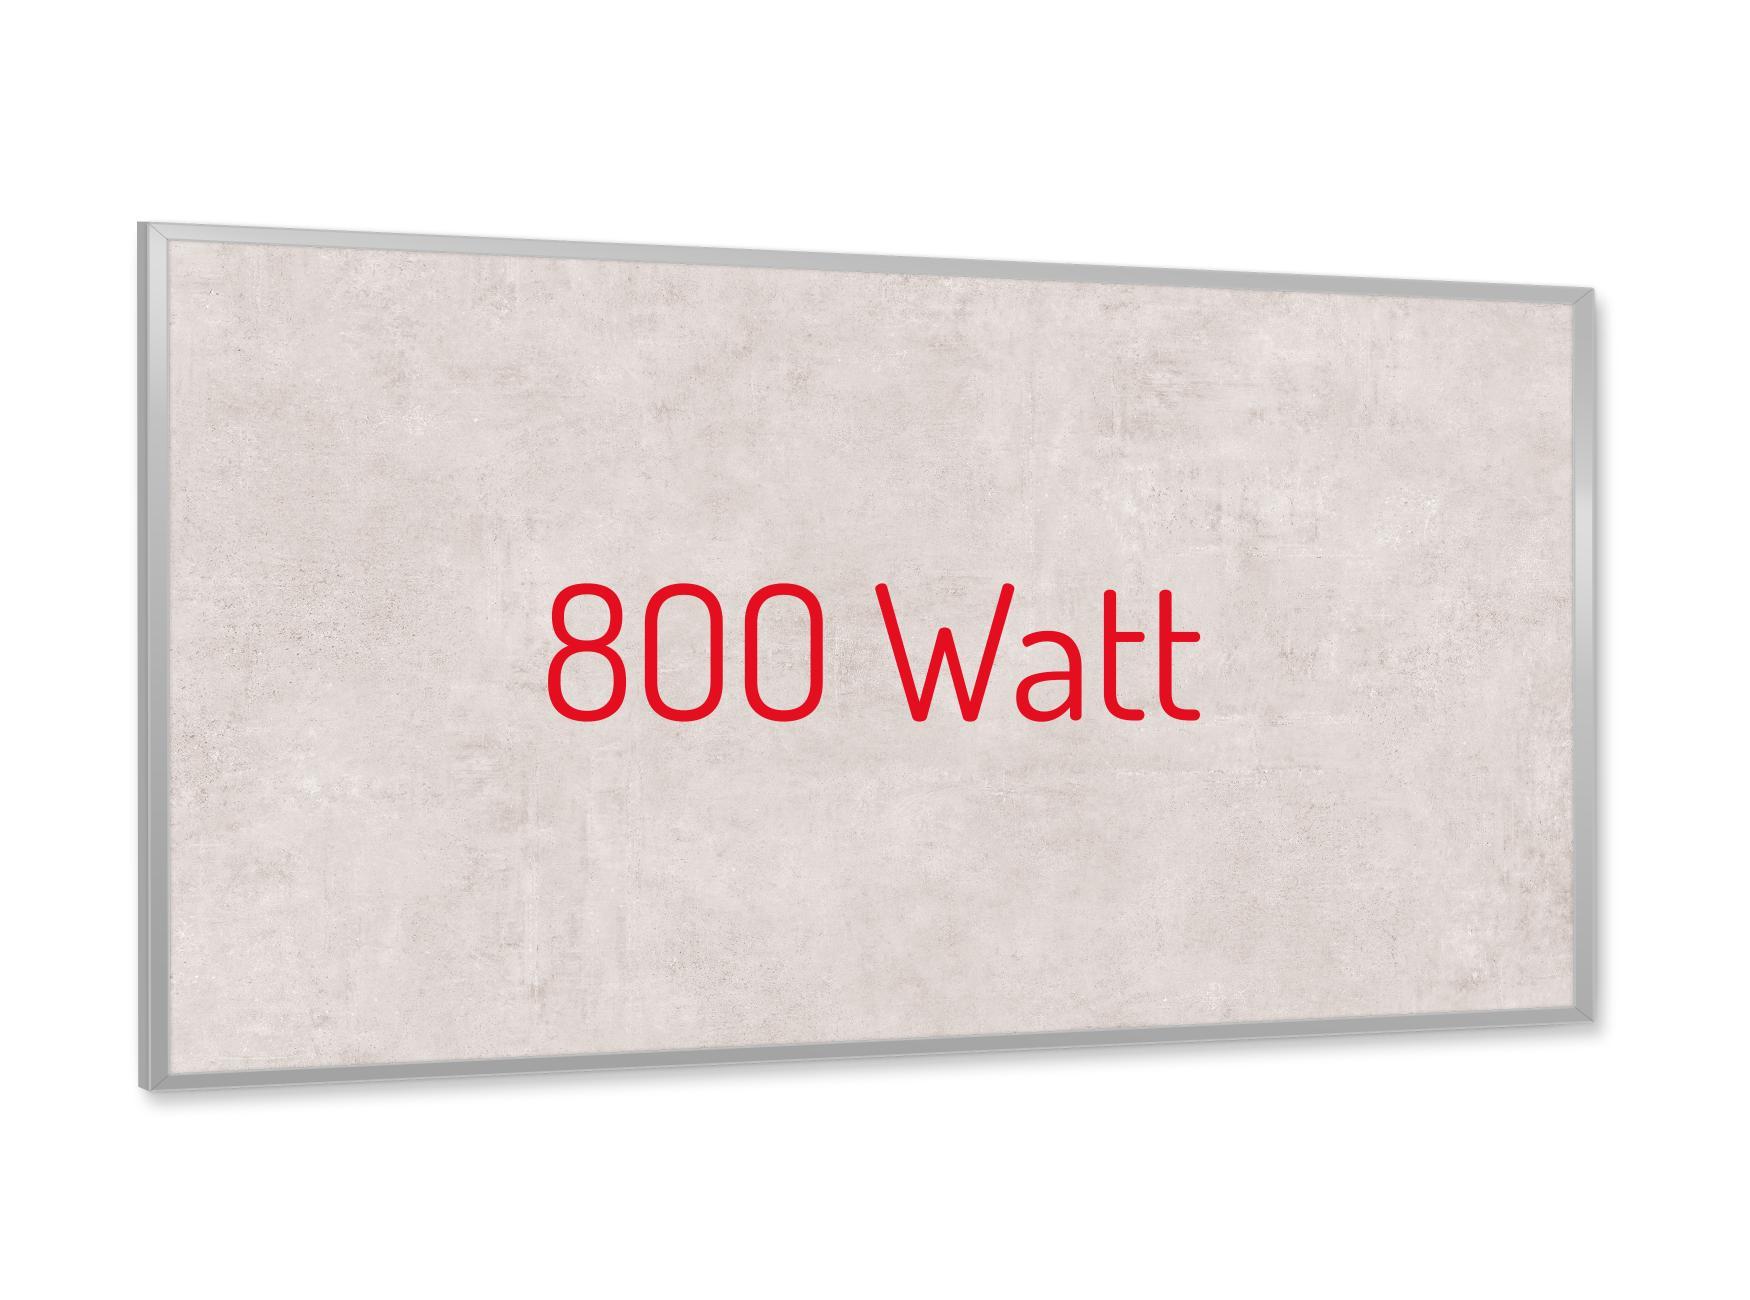 PowerSun Keramik Struktur Orlando 800 Watt 60x120cm